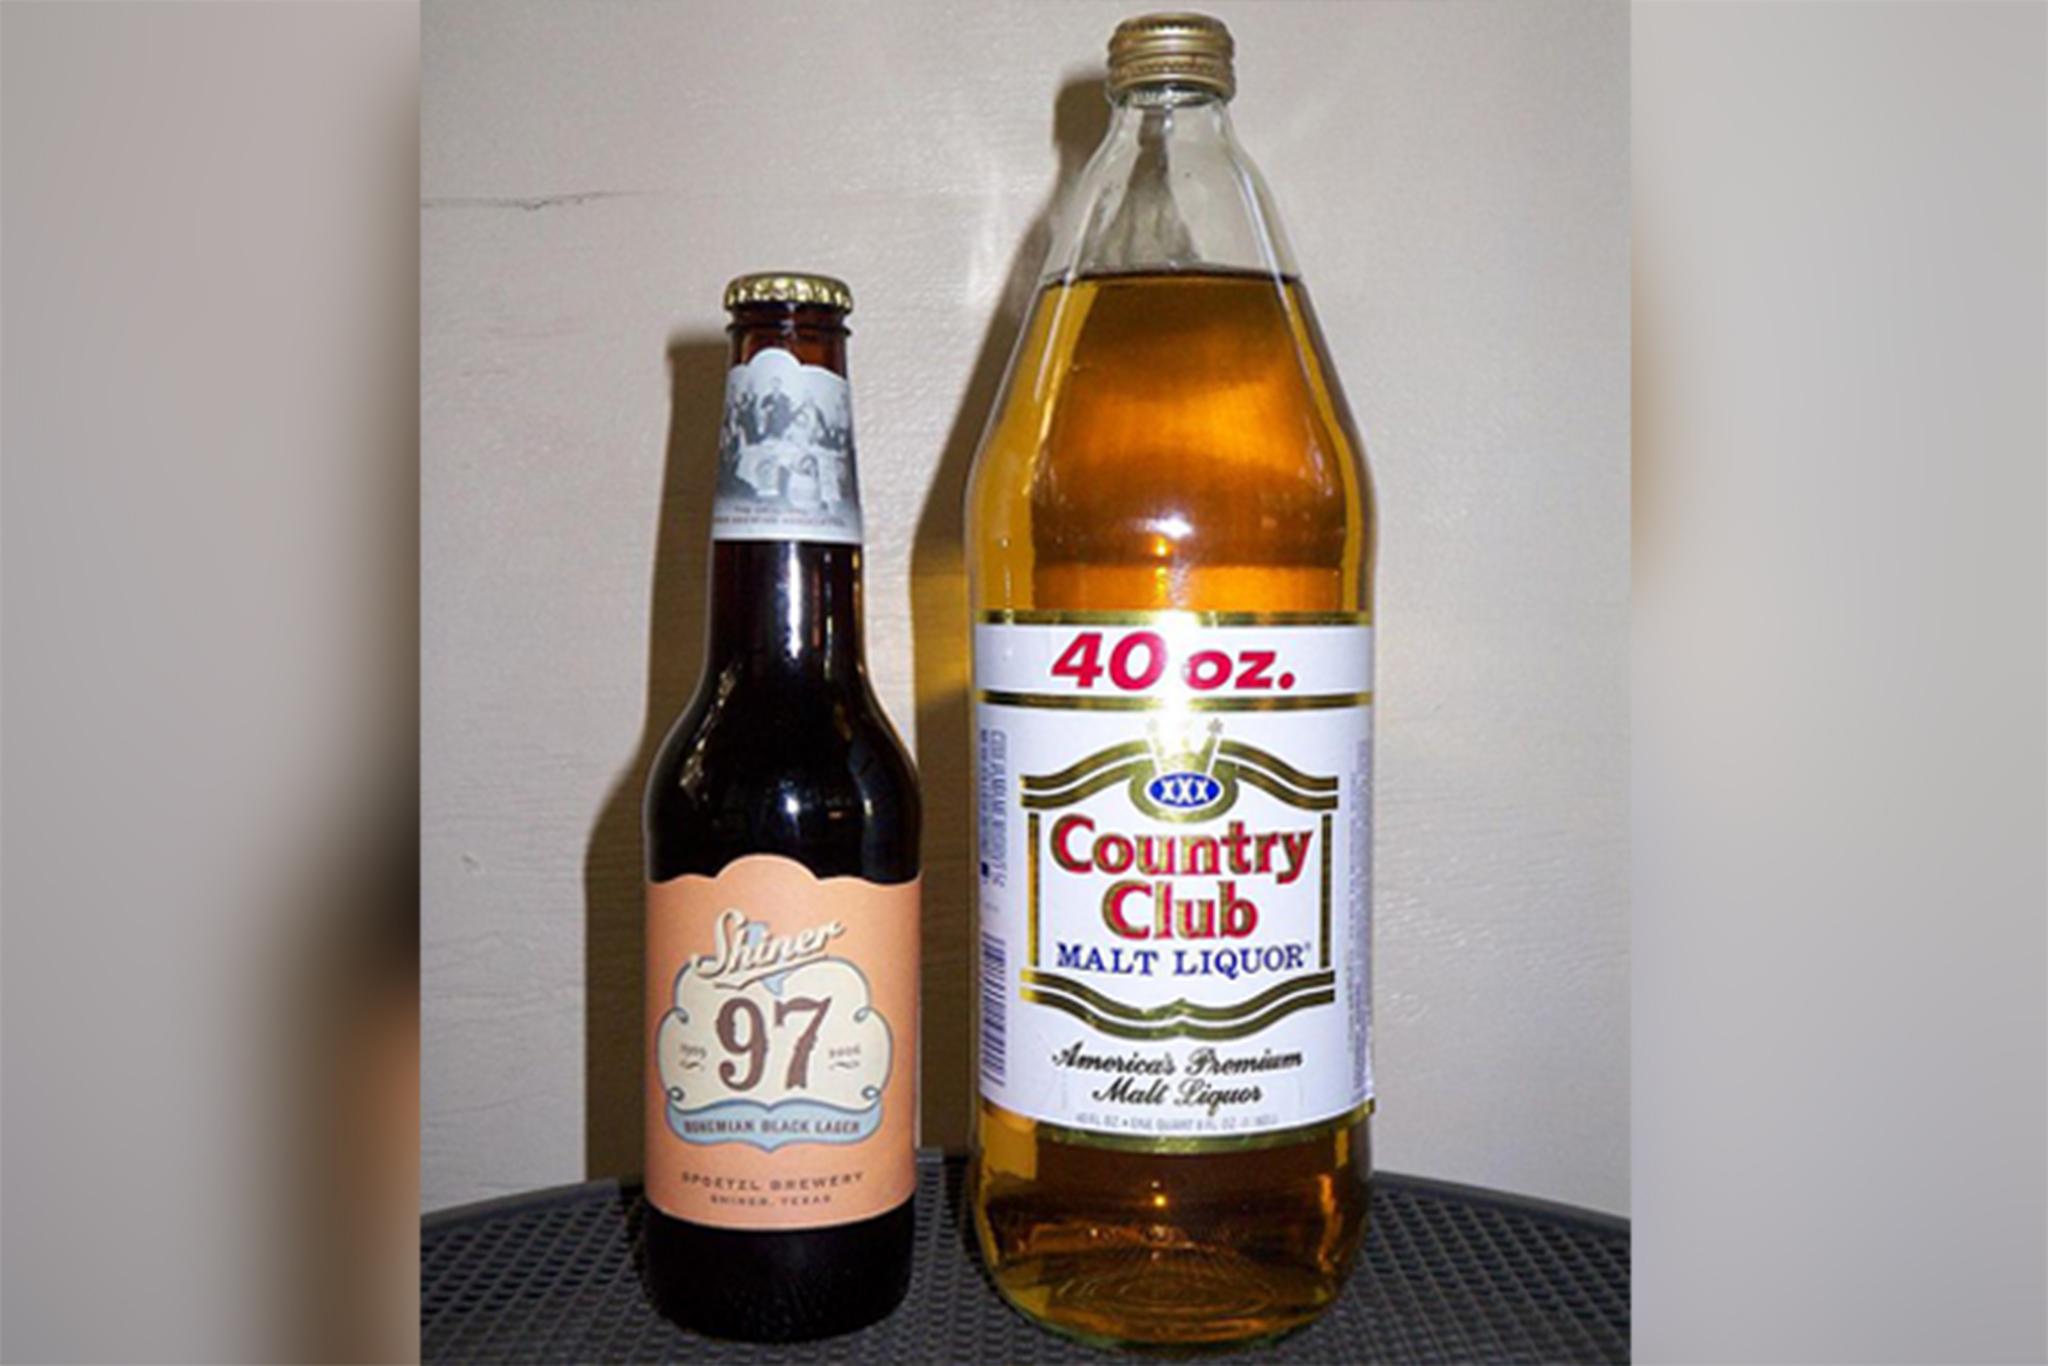 Discover the affordable glory of malt liquor